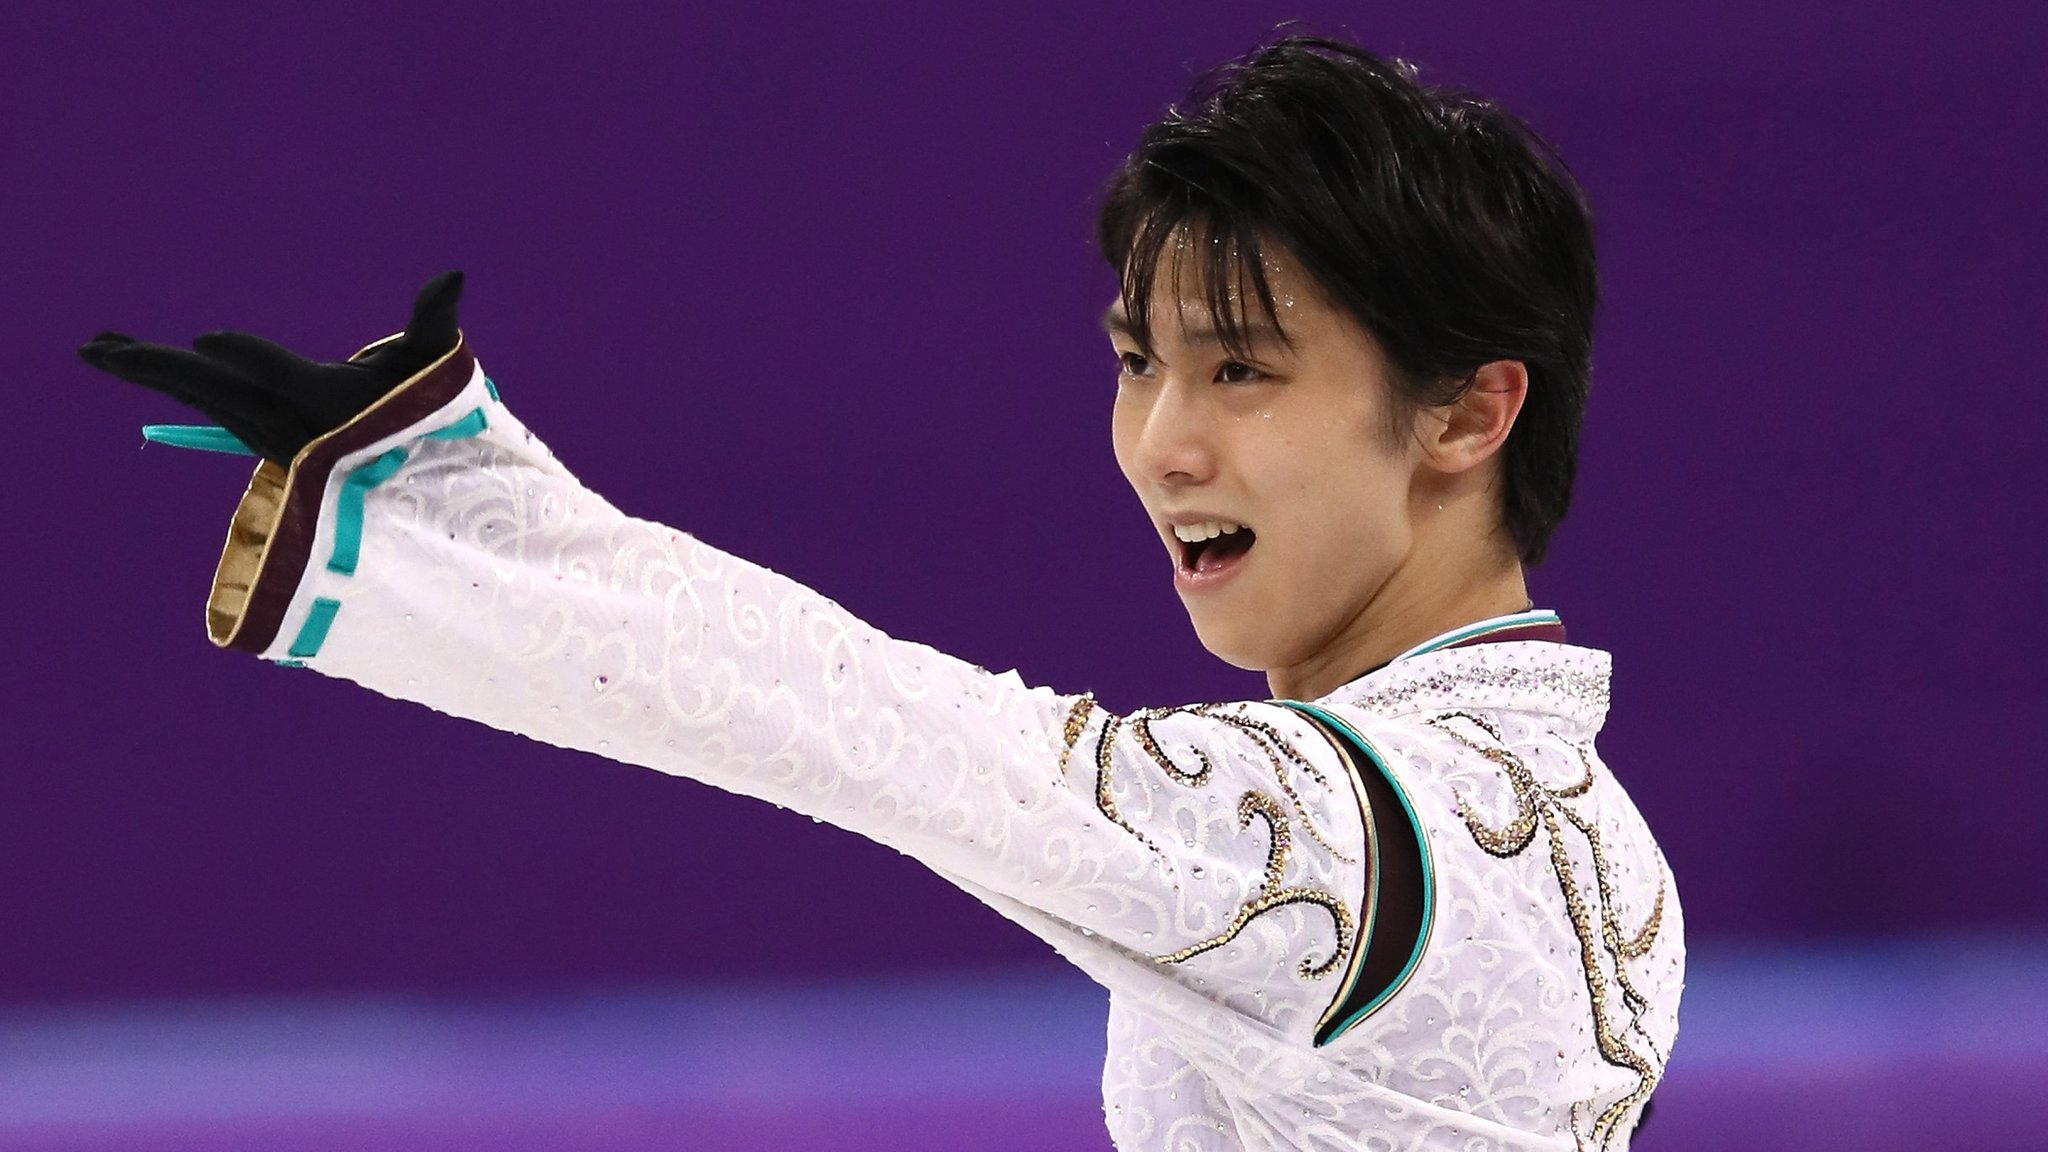 Winter Olympics: Japan's Yuzuru Hanyu wins historic figure skating gold